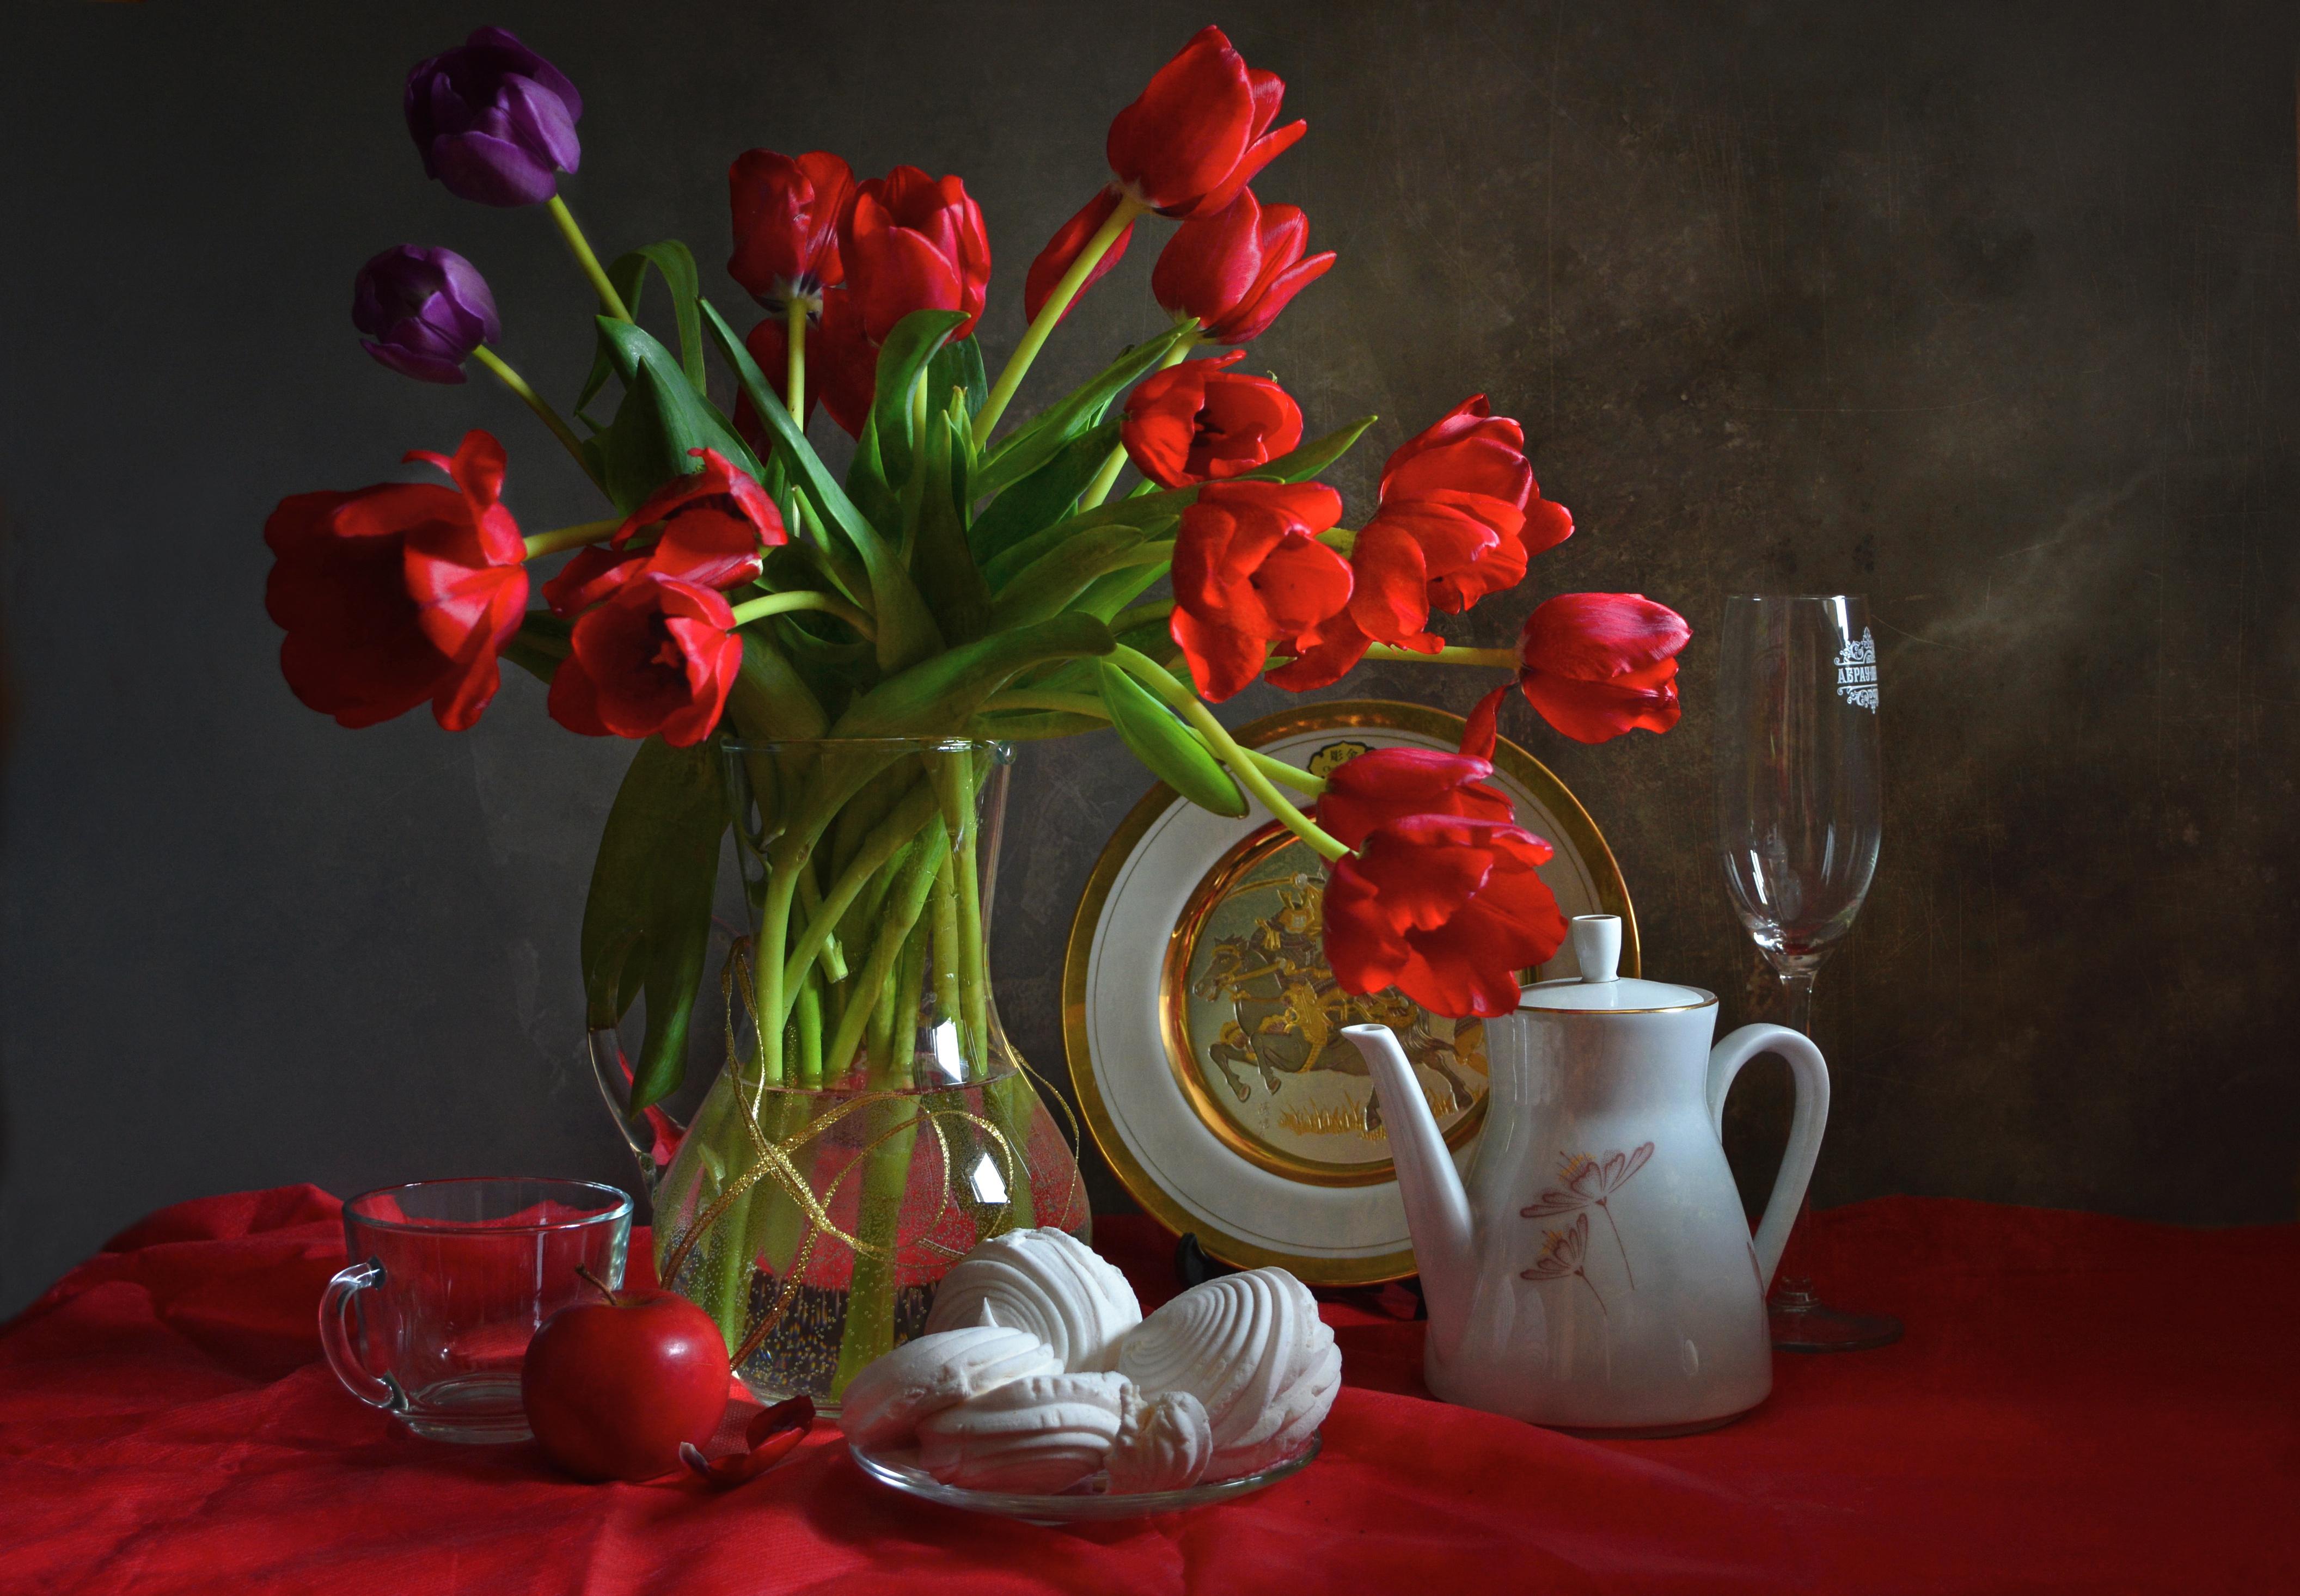 цветы ваза букет посуда flowers vase bouquet dishes  № 1733802 загрузить